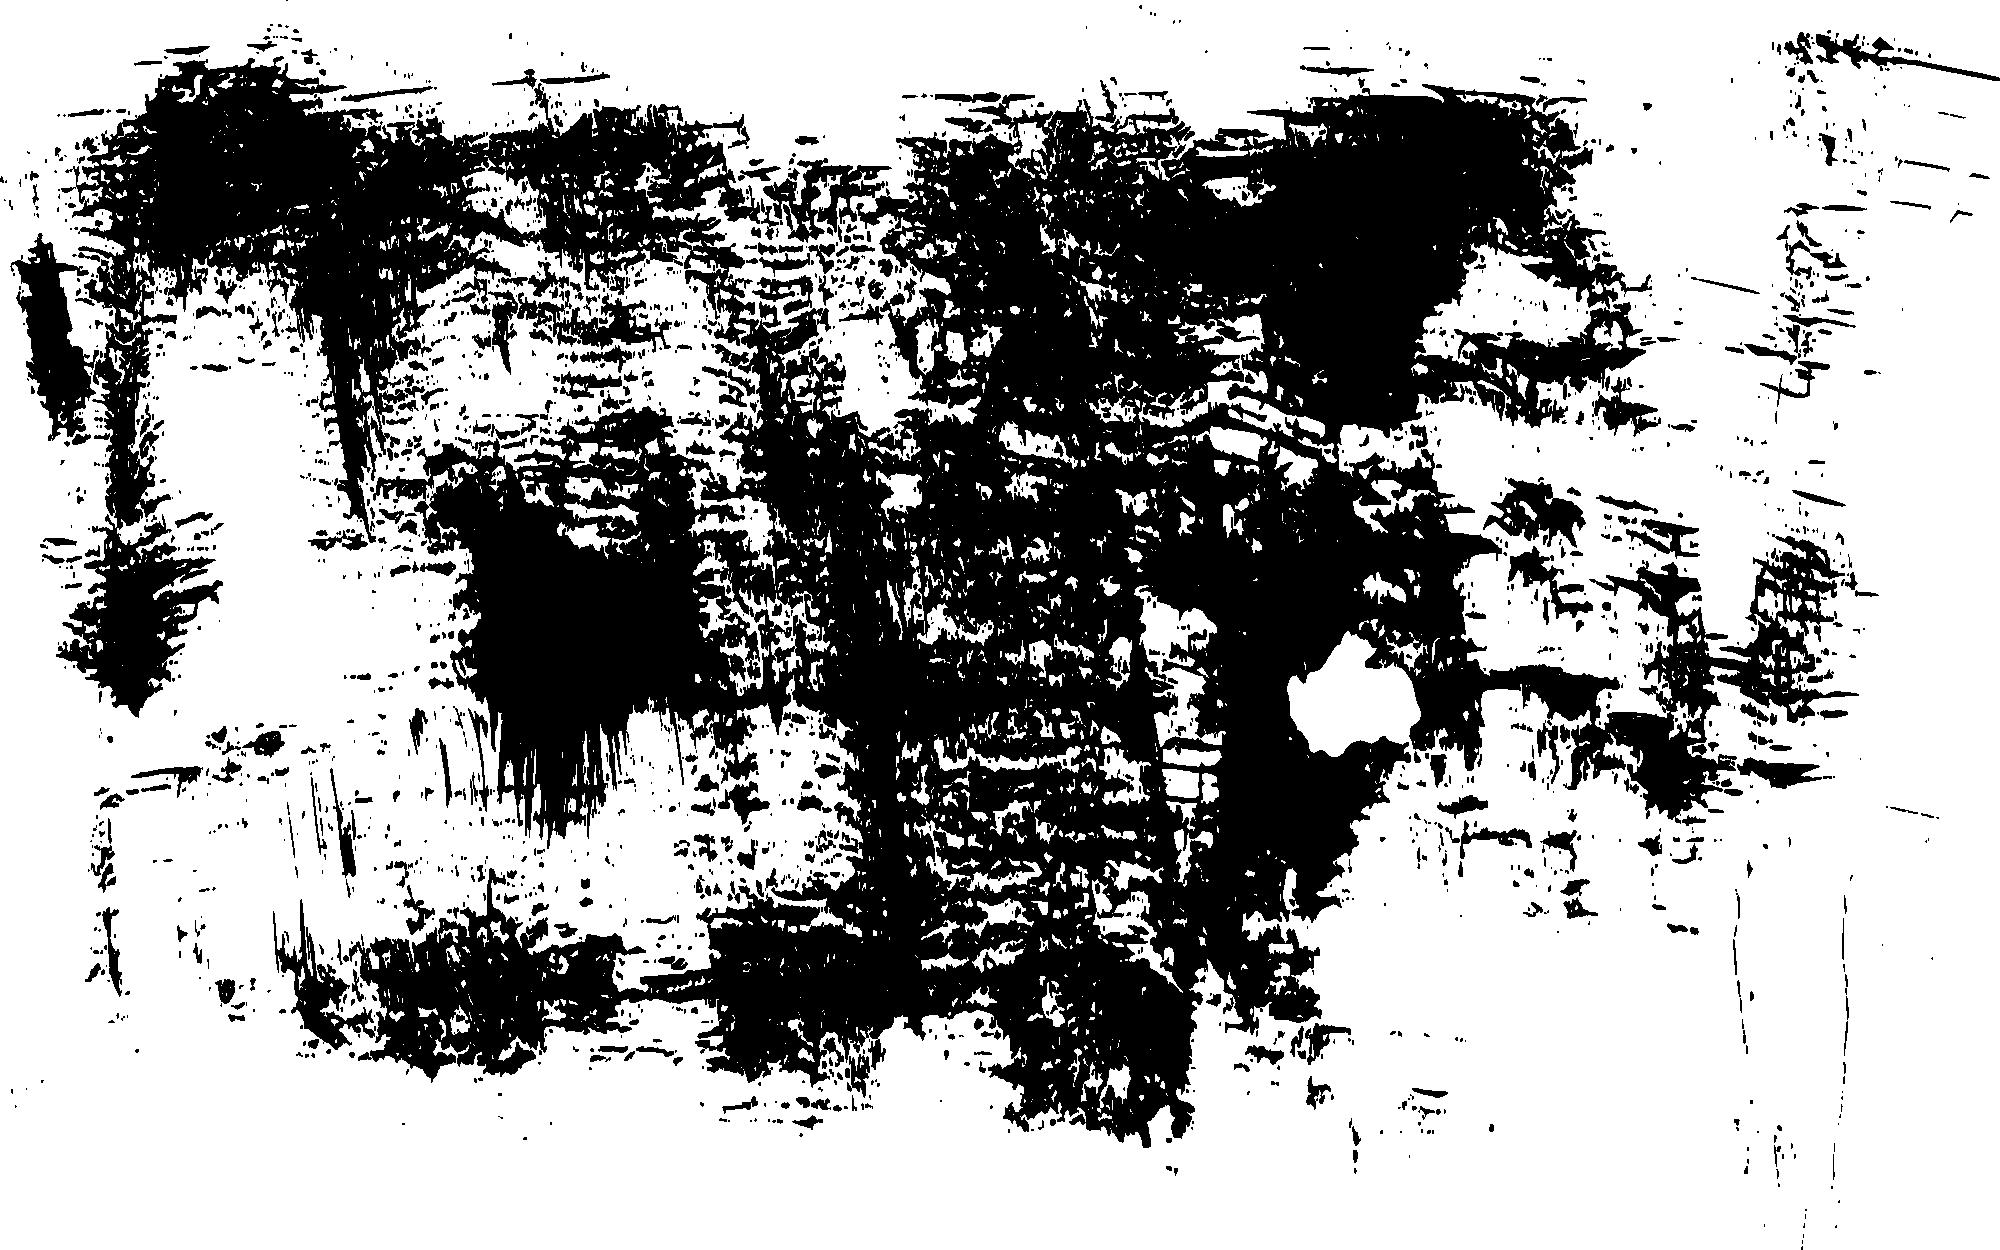 5 Grunge Overlay Textures (PNG Transparent) | OnlyGFX.com